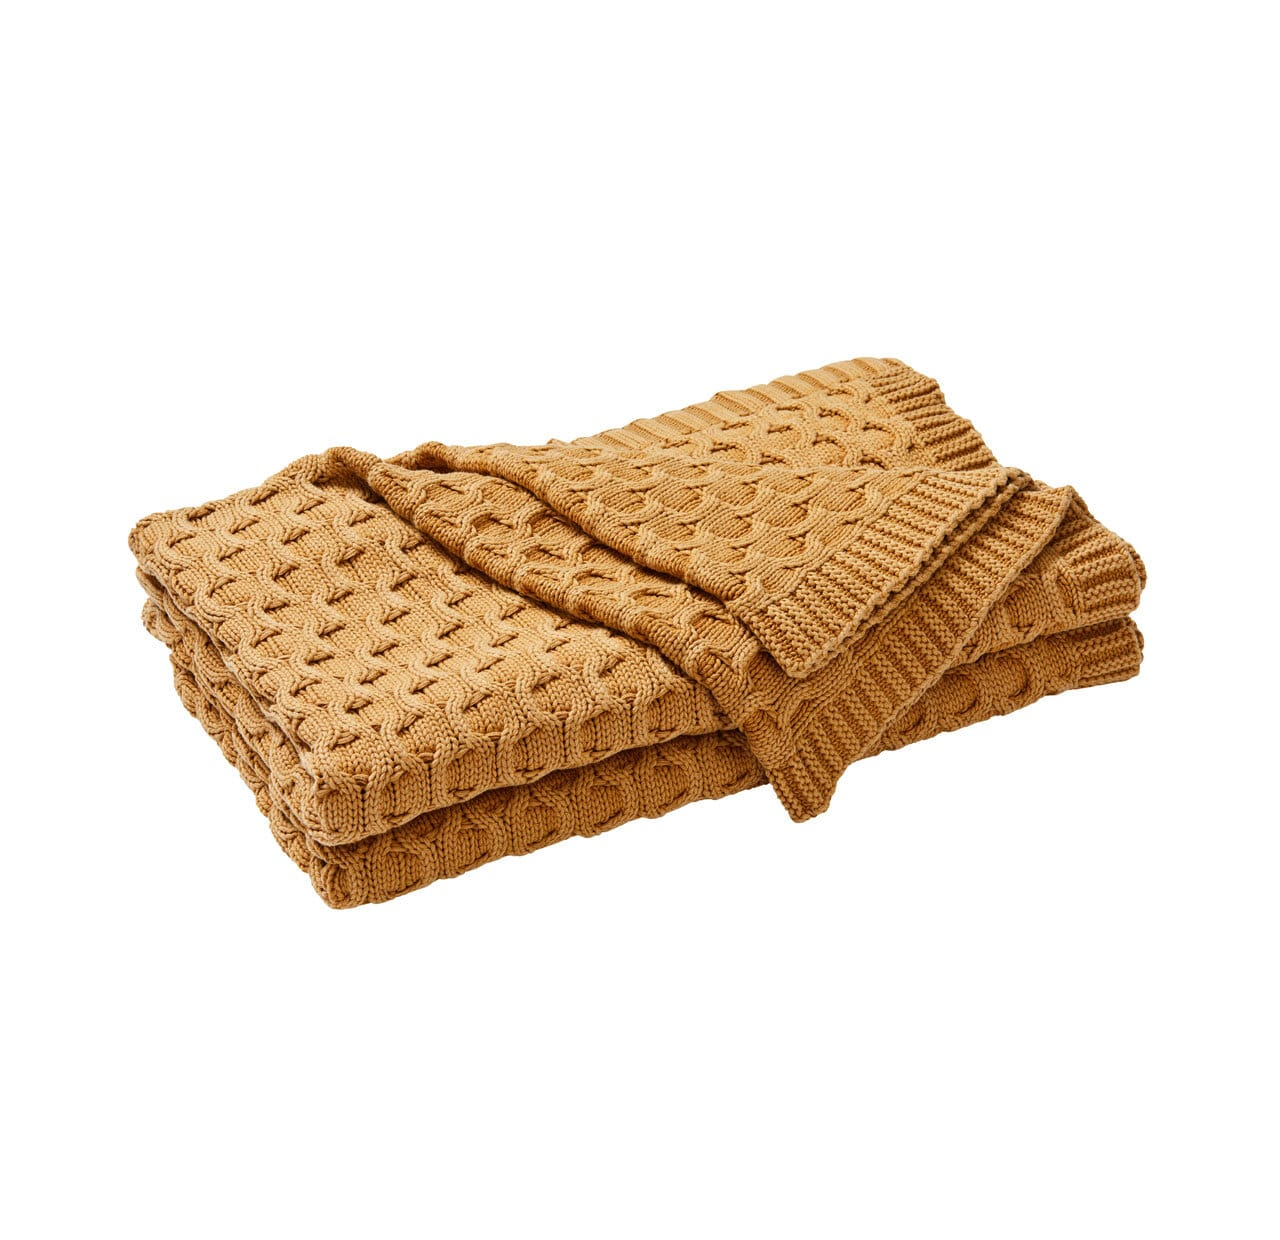 Delaney Throw Blanket - Dijon